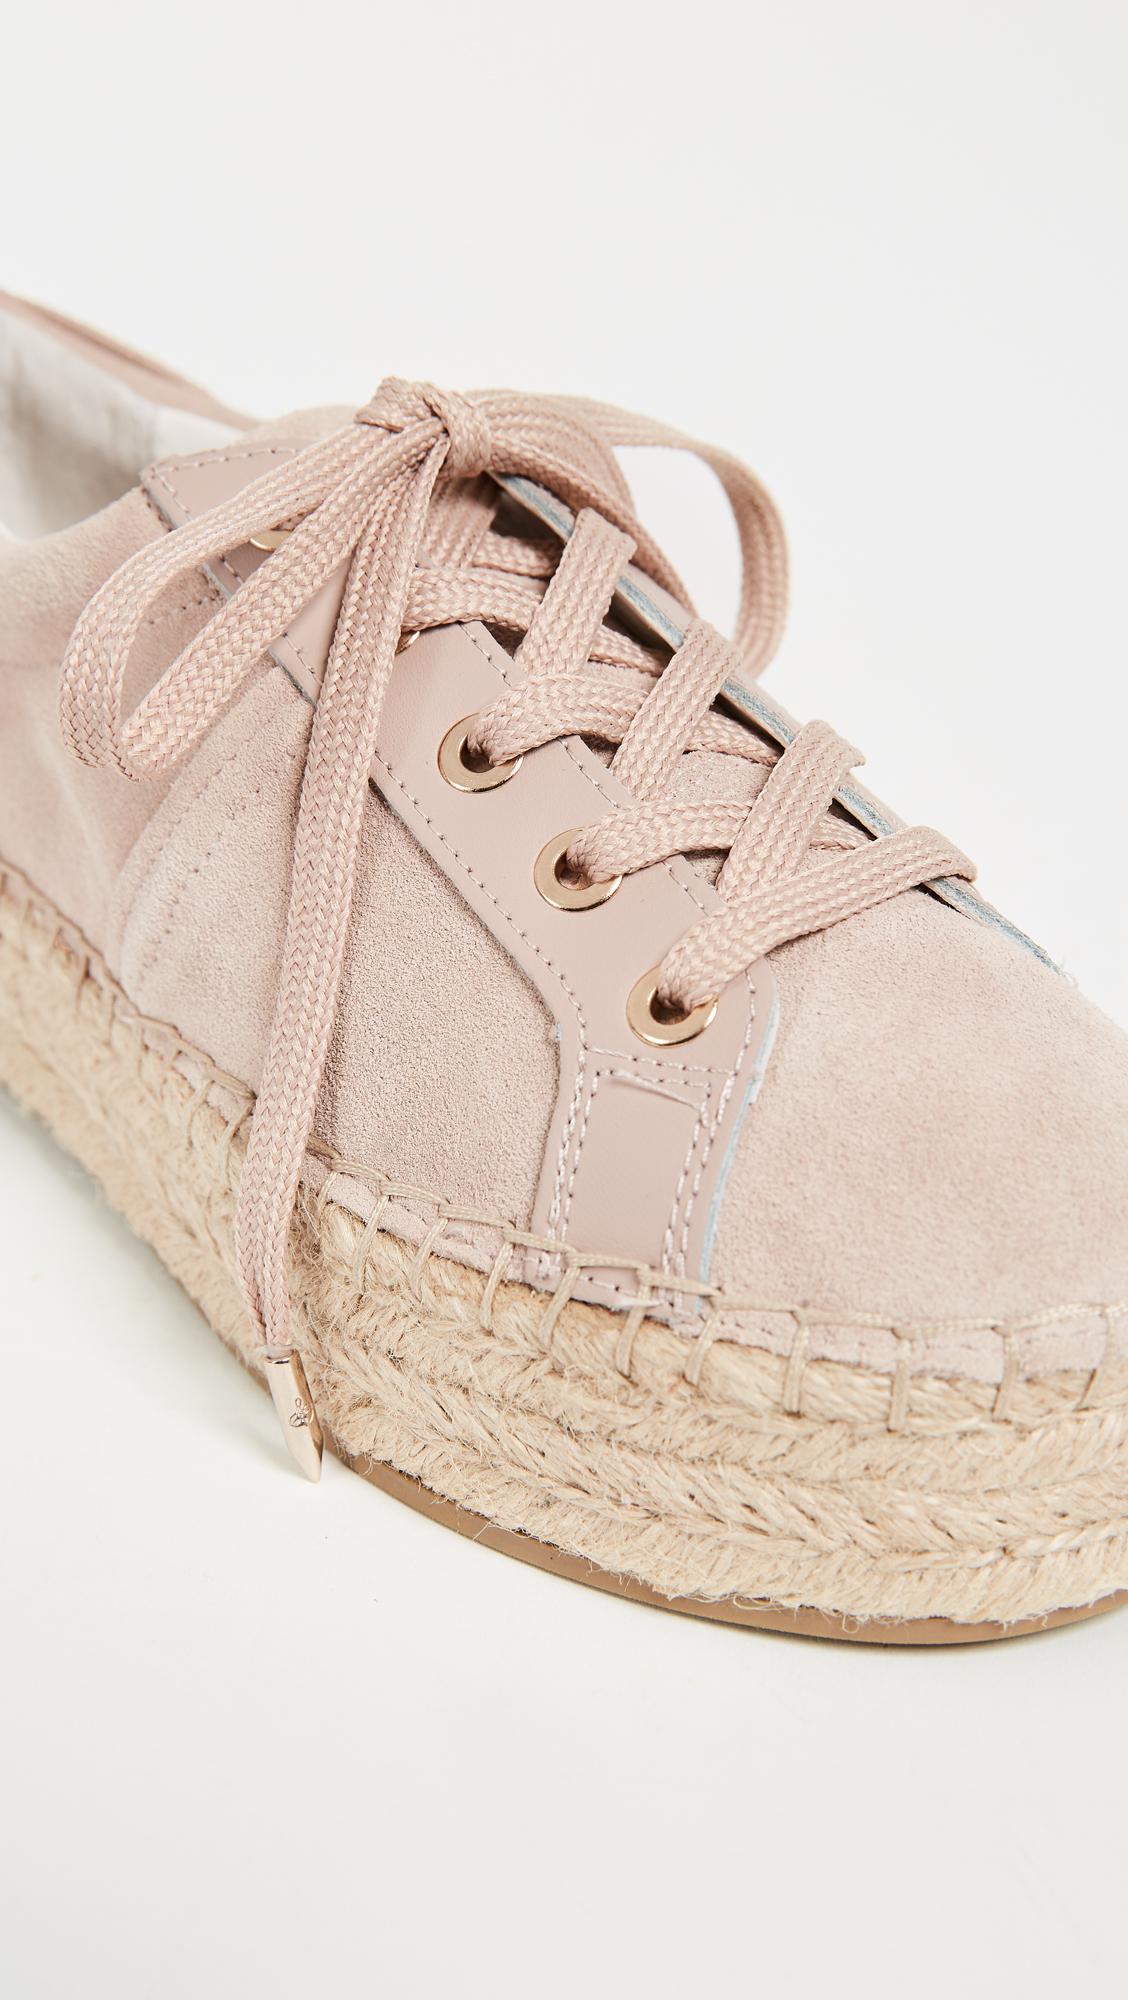 774cee01117d08 Sam Edelman Carleigh Platform Espadrille Sneakers